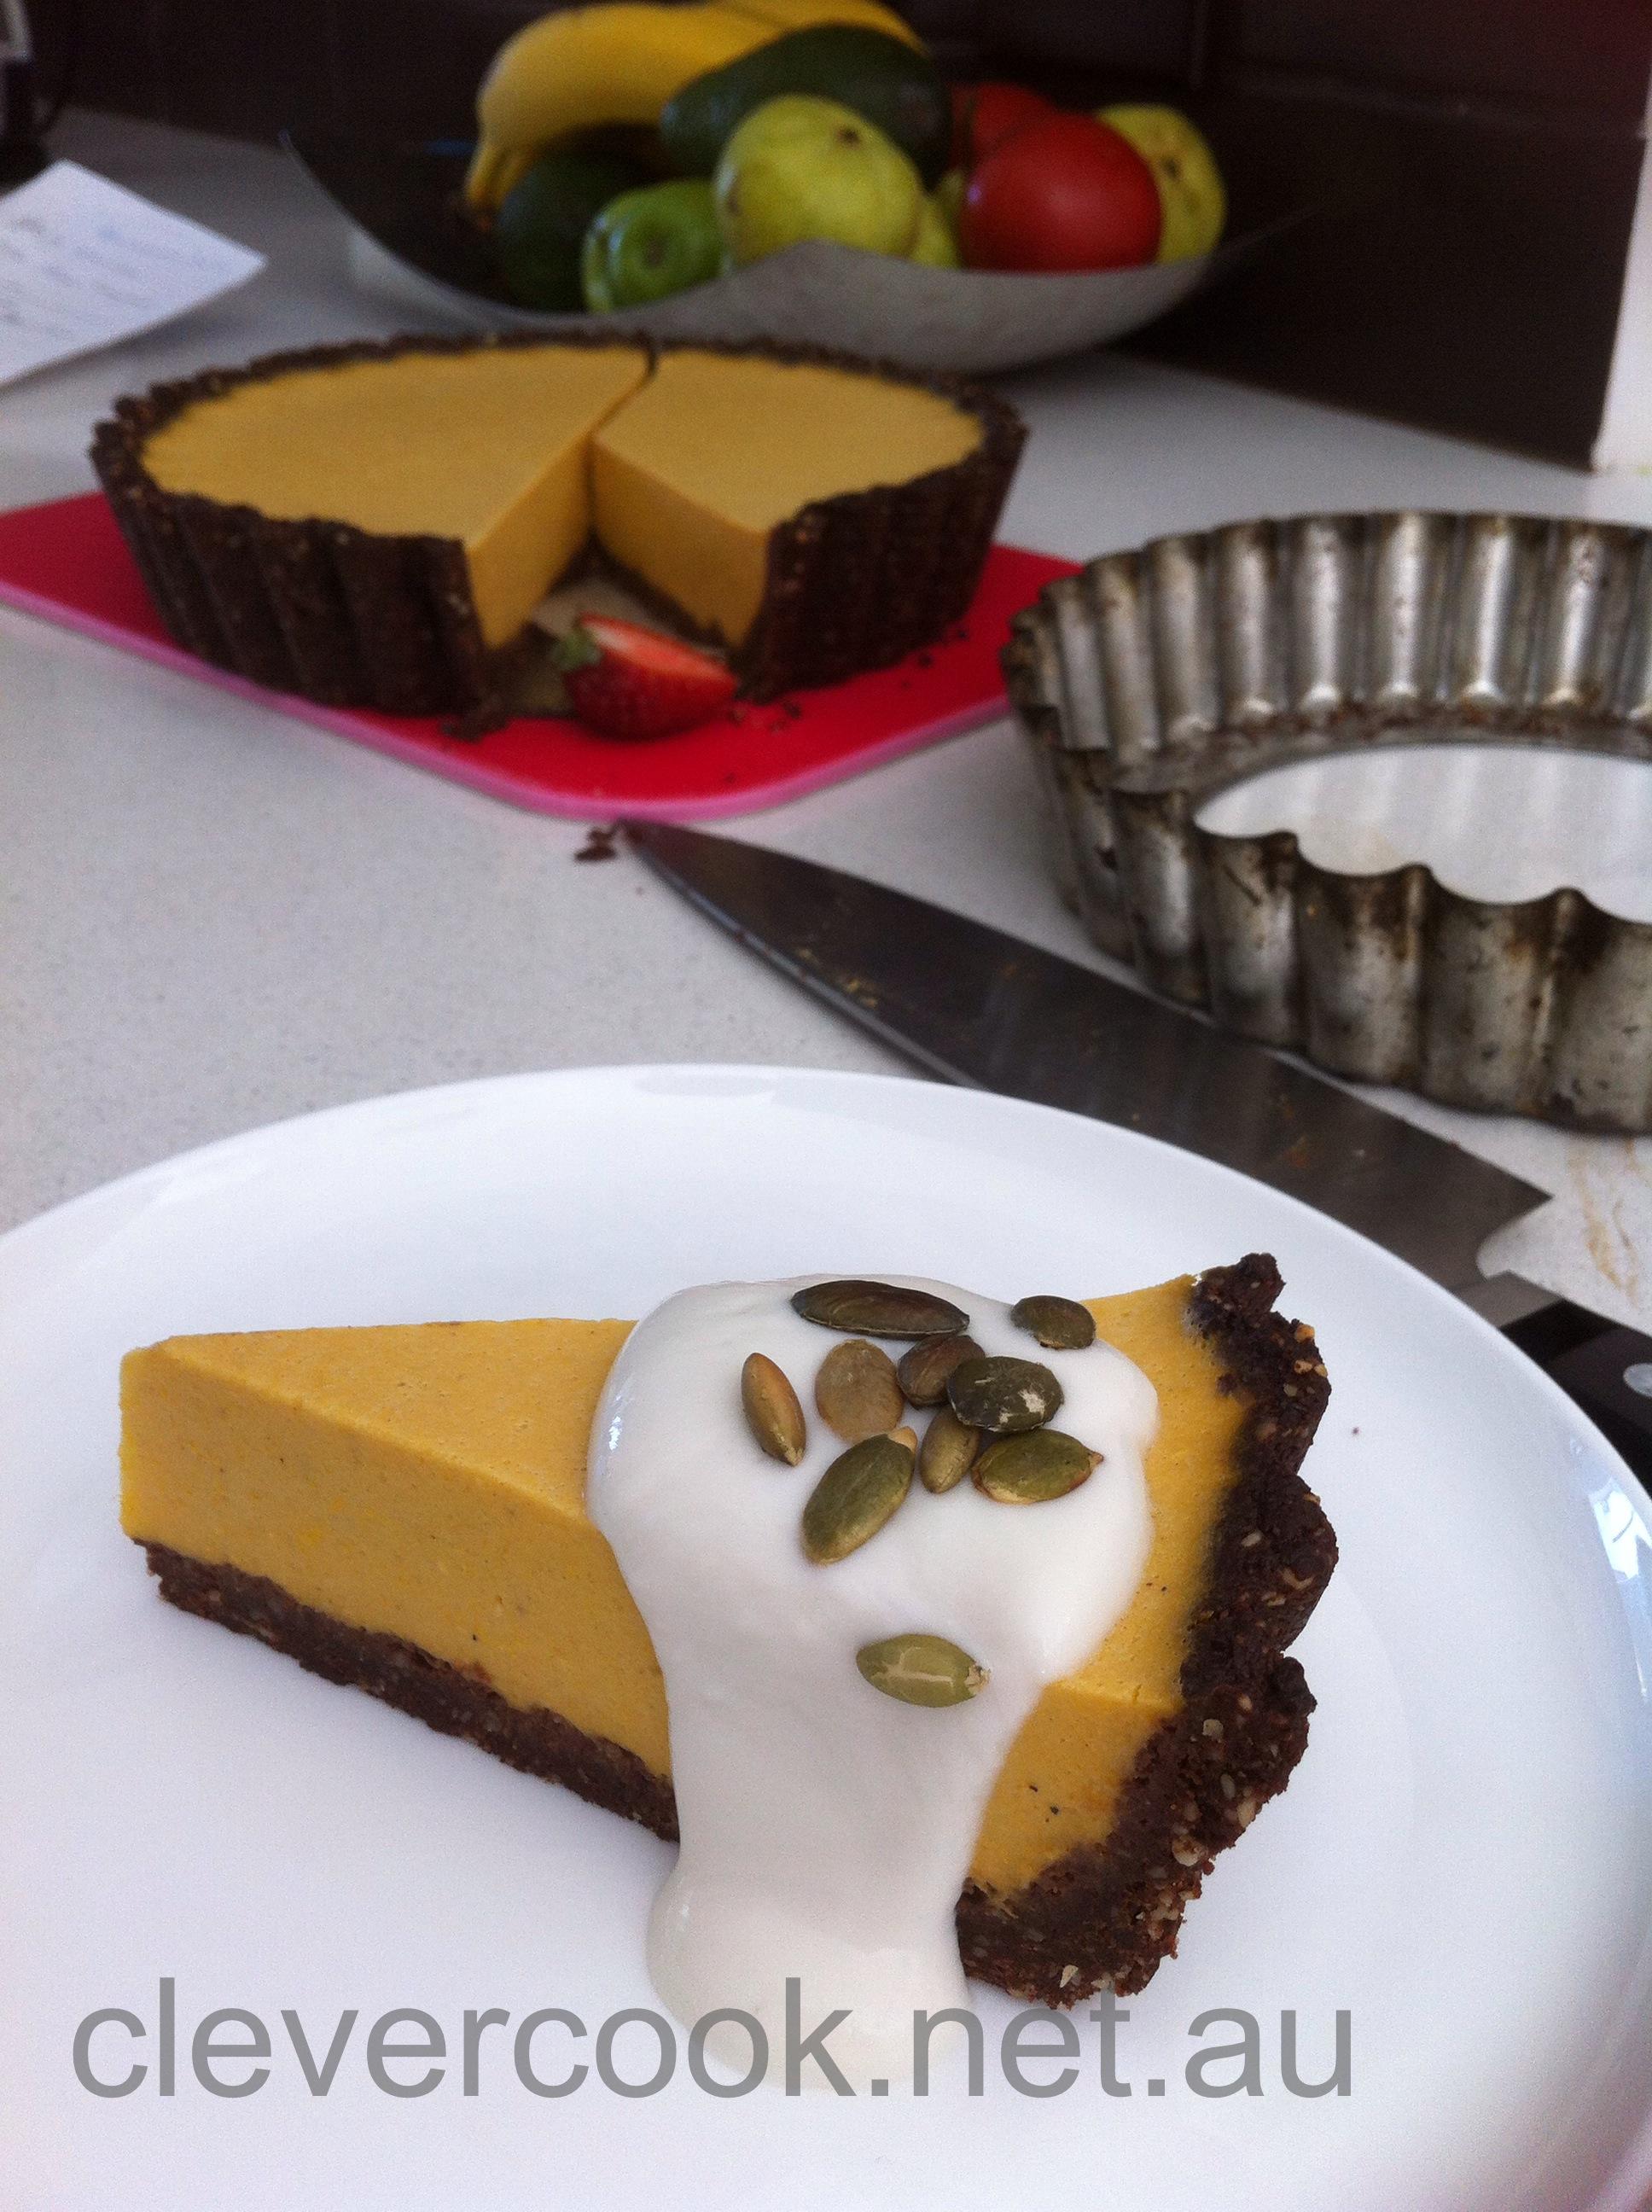 Twisted pumpkin pie or pumpkin pie with a twist clevercook for Pumpkin pie with a twist